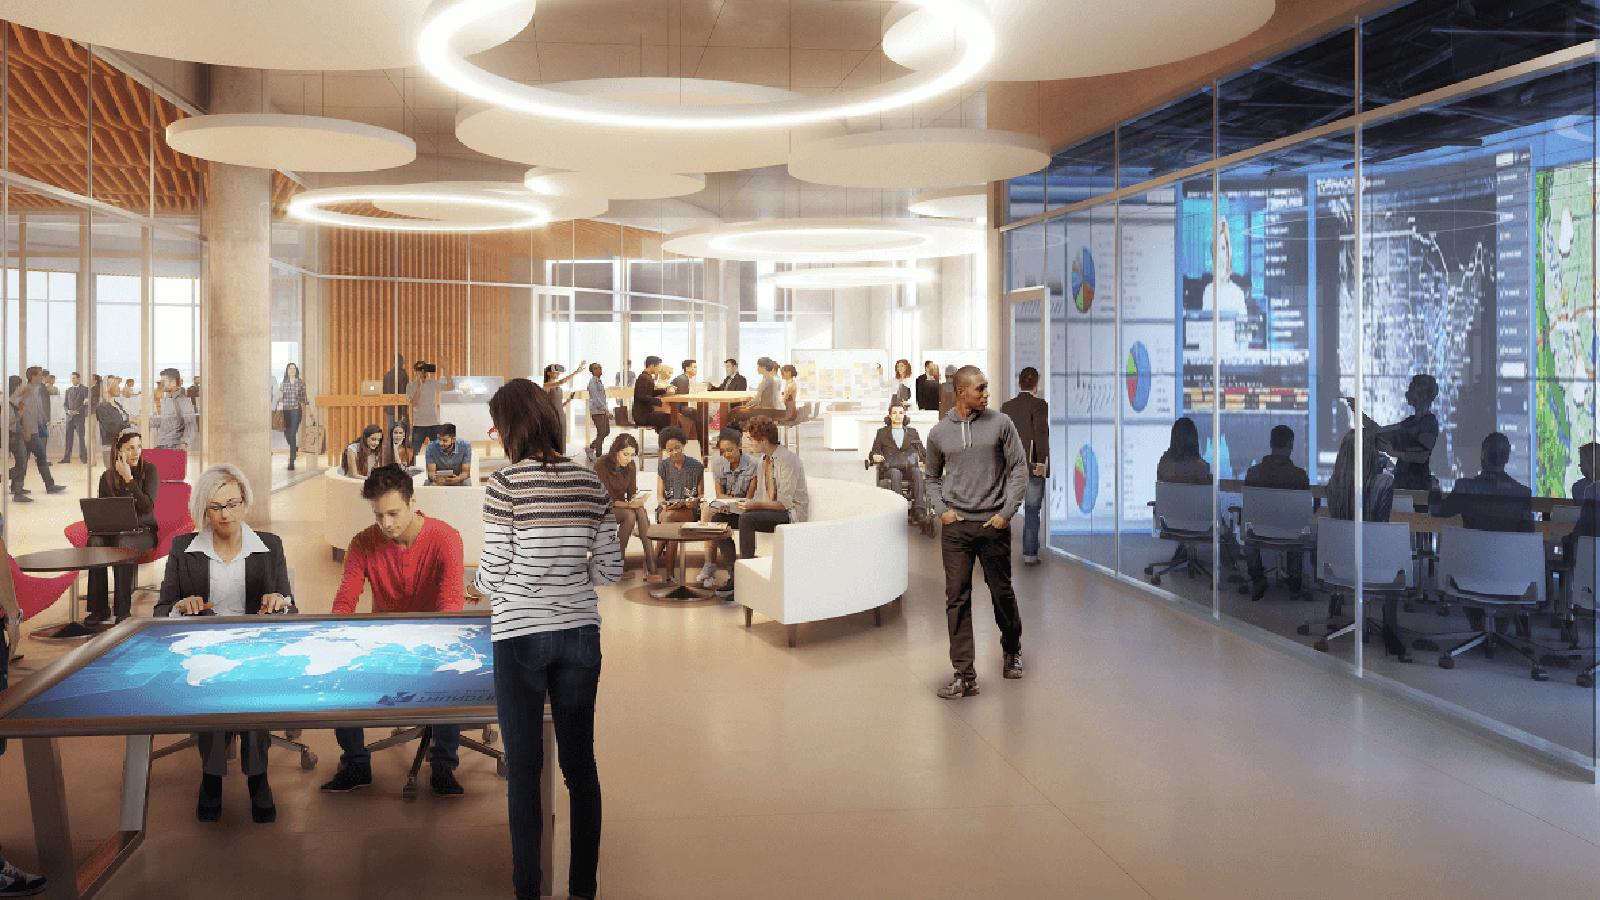 rendering of new Thunderbird school facility